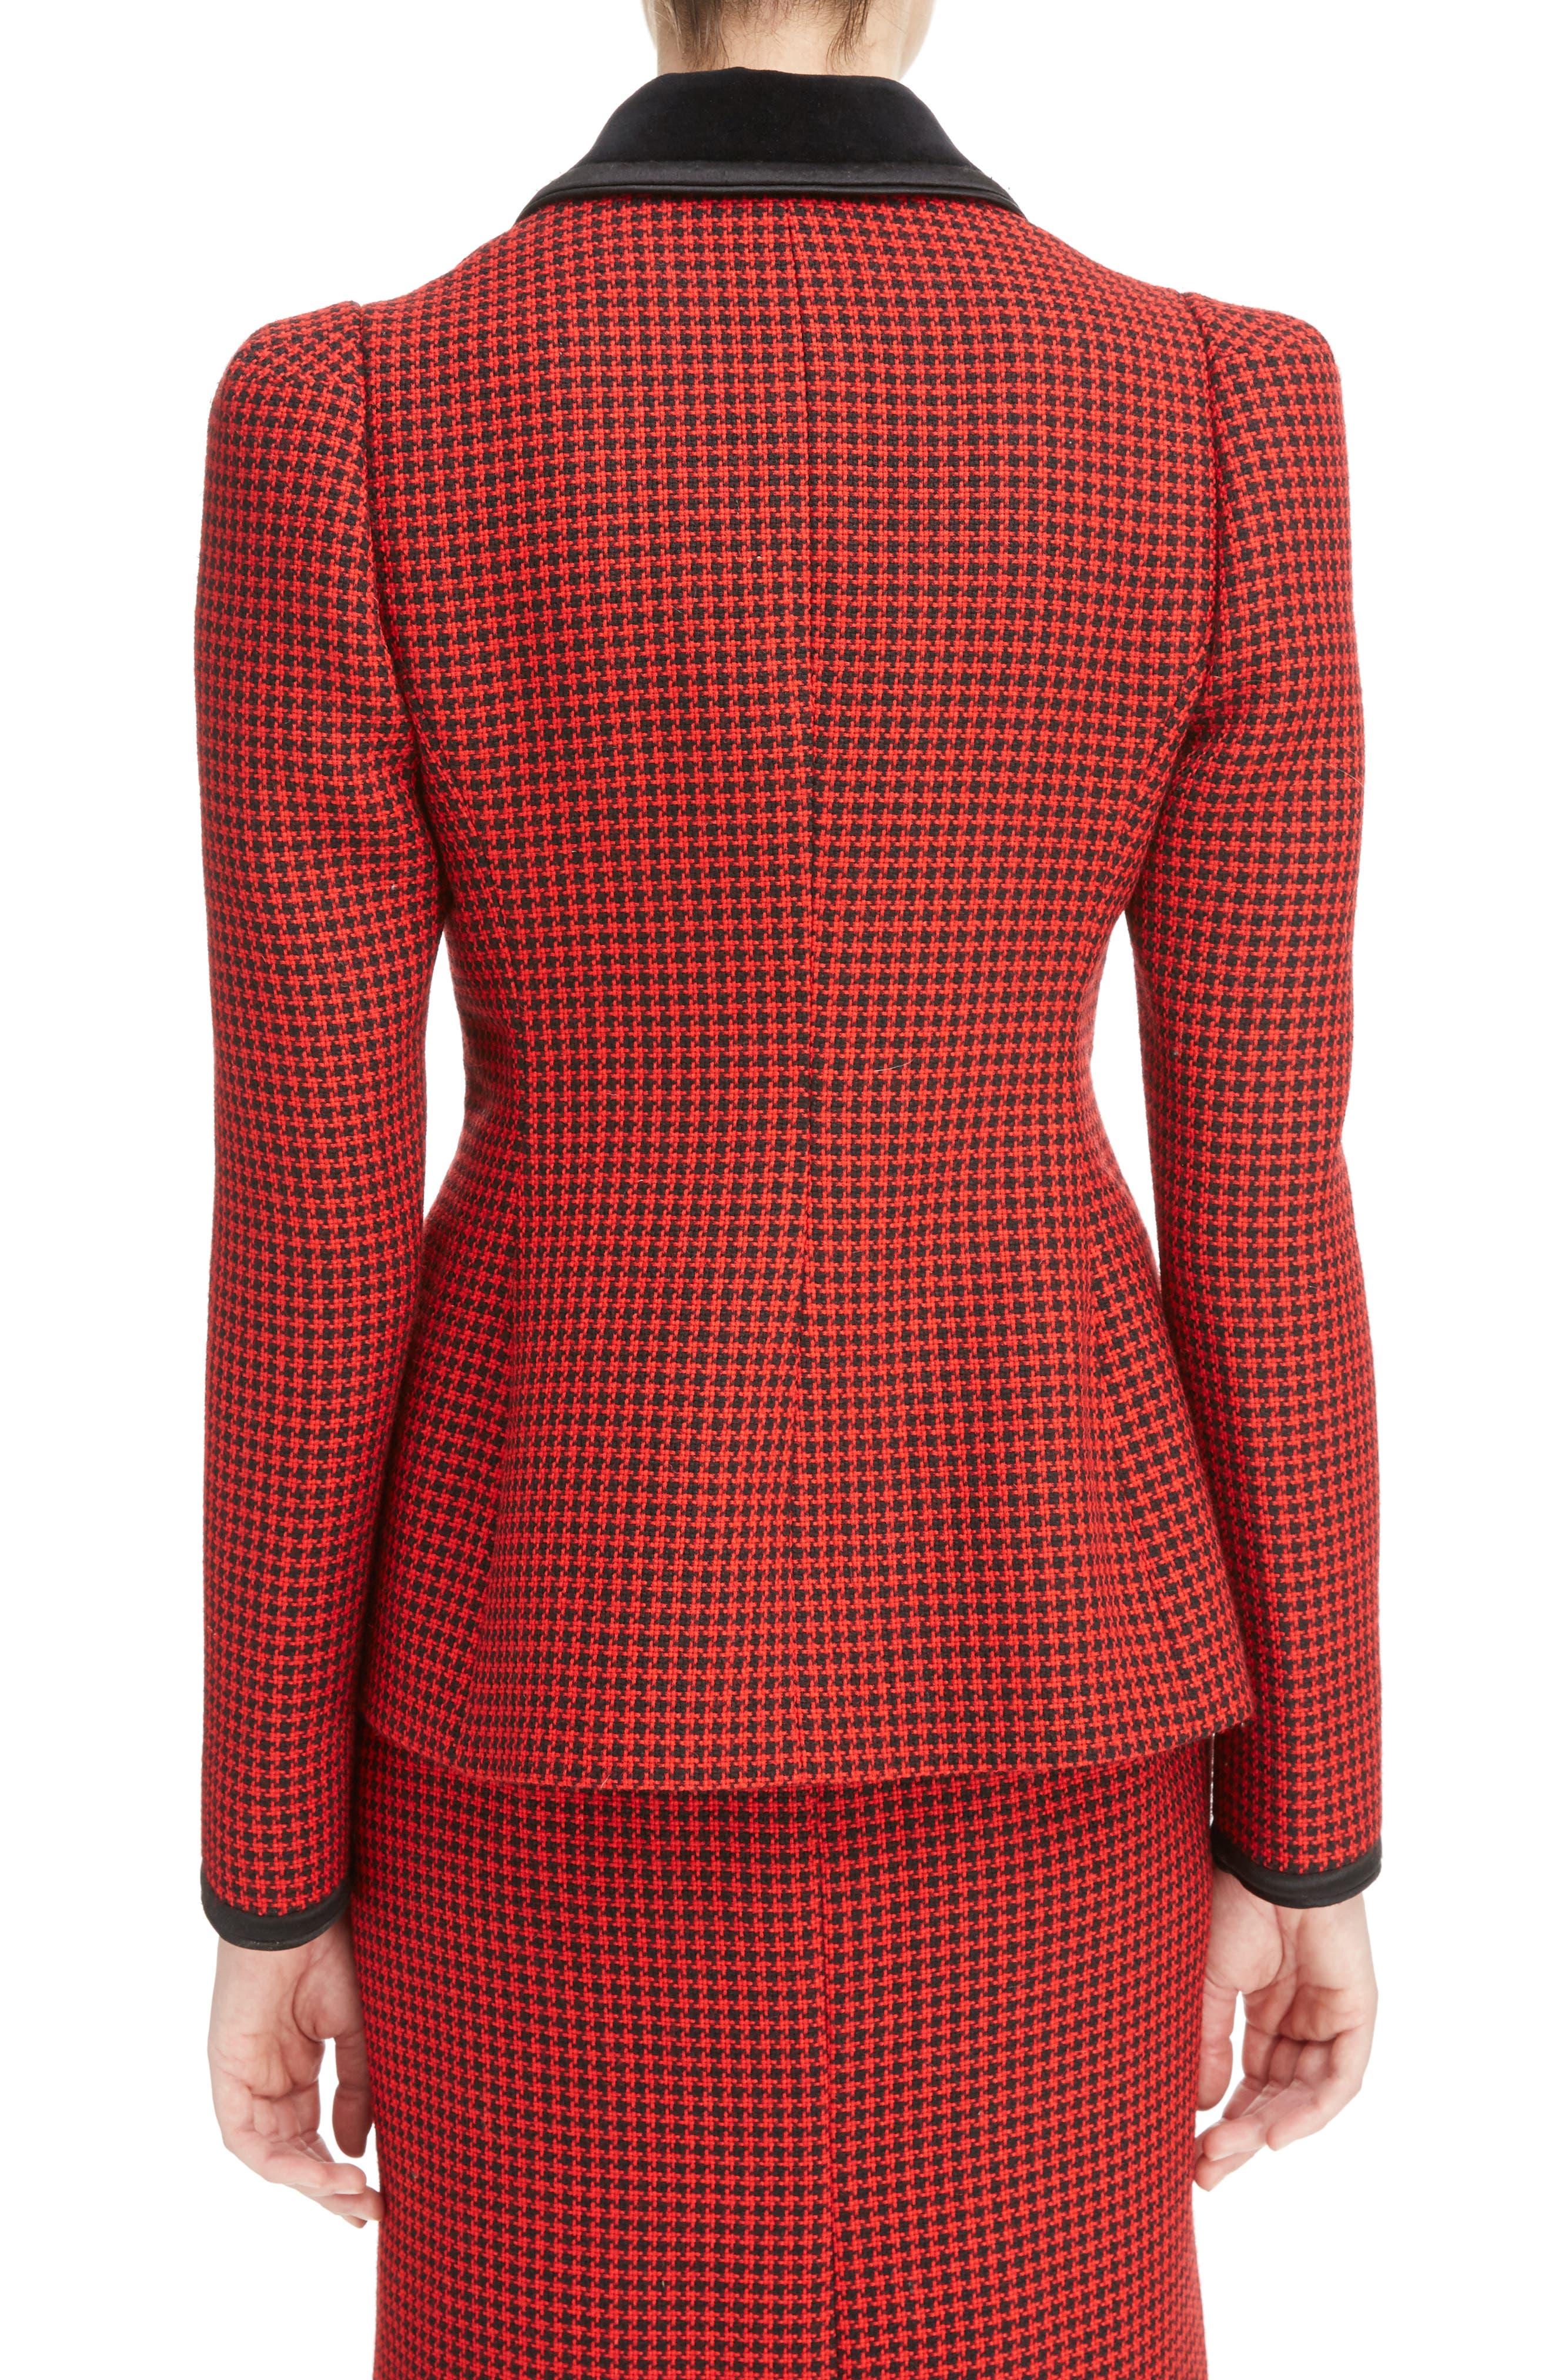 Paladini Houndstooth Wool Jacket,                             Alternate thumbnail 2, color,                             Scarlet/ Black